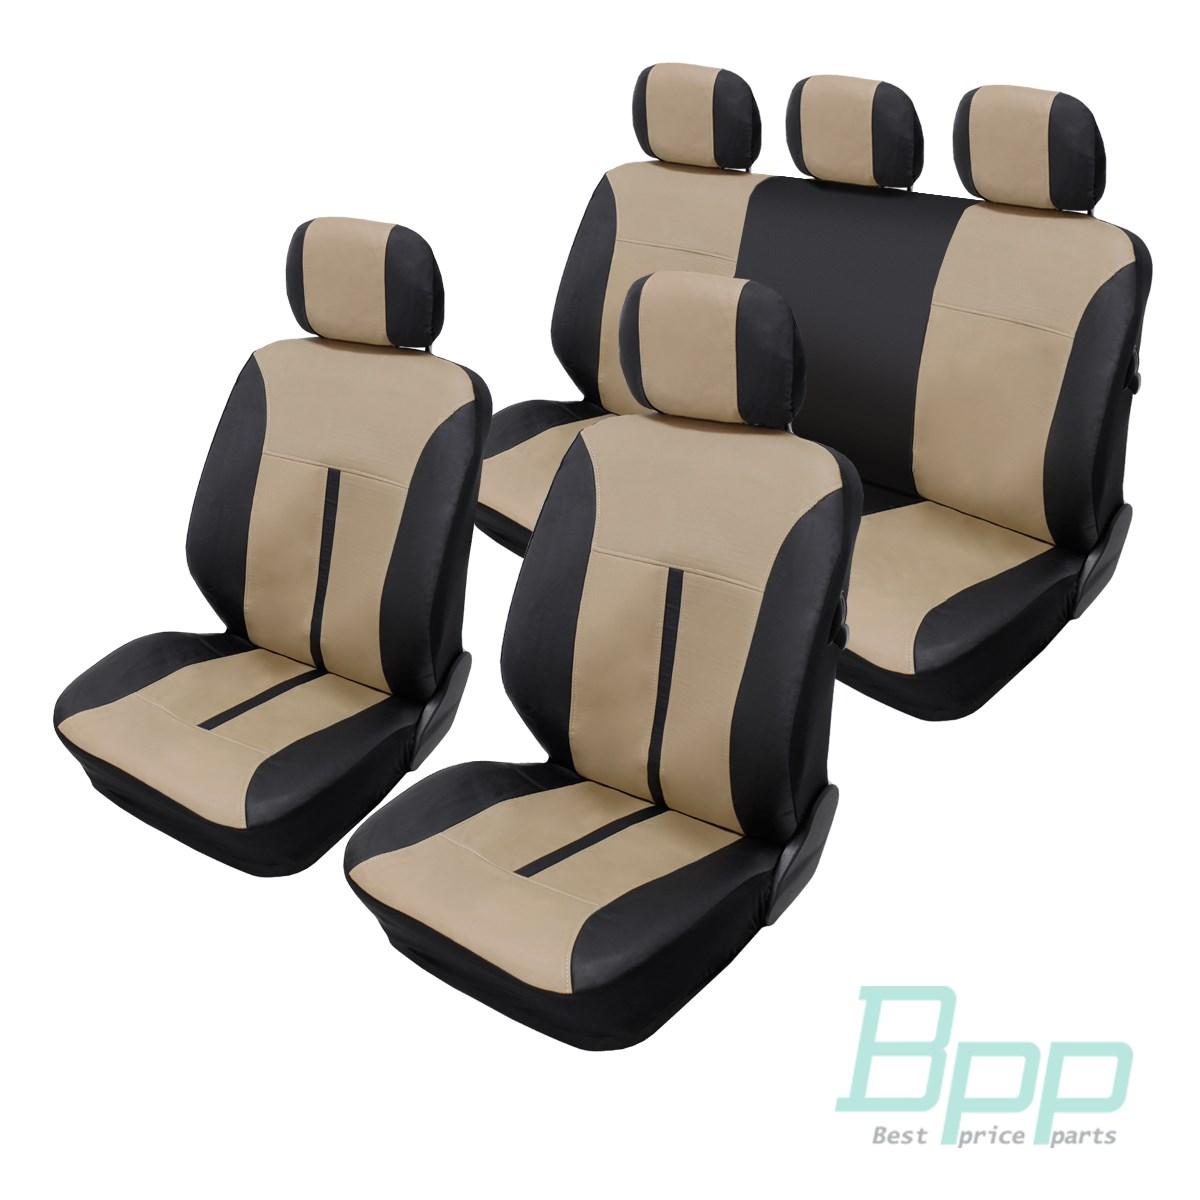 sitzbezug auto sitzbez ge set kunstleder sitz schonbezug beige schwarz ebay. Black Bedroom Furniture Sets. Home Design Ideas